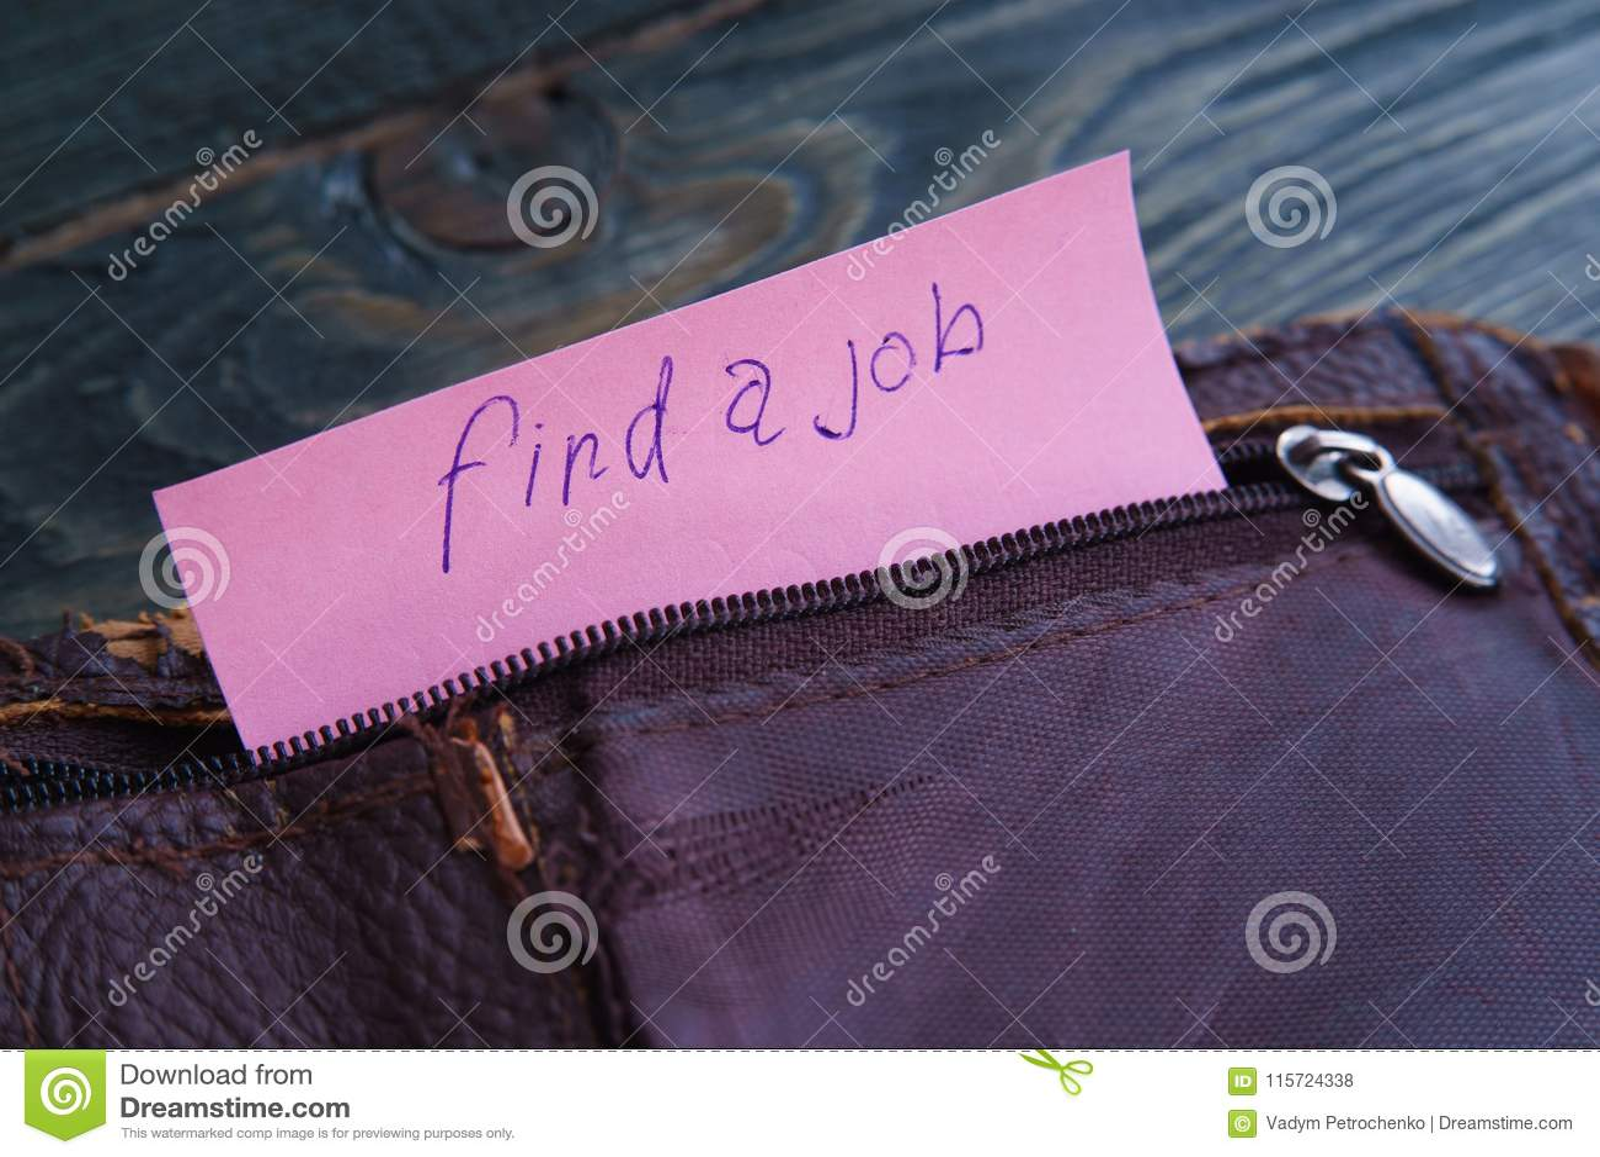 Armod arbetslöshet, konkursbegrepp Gammal sjaskig tom leat